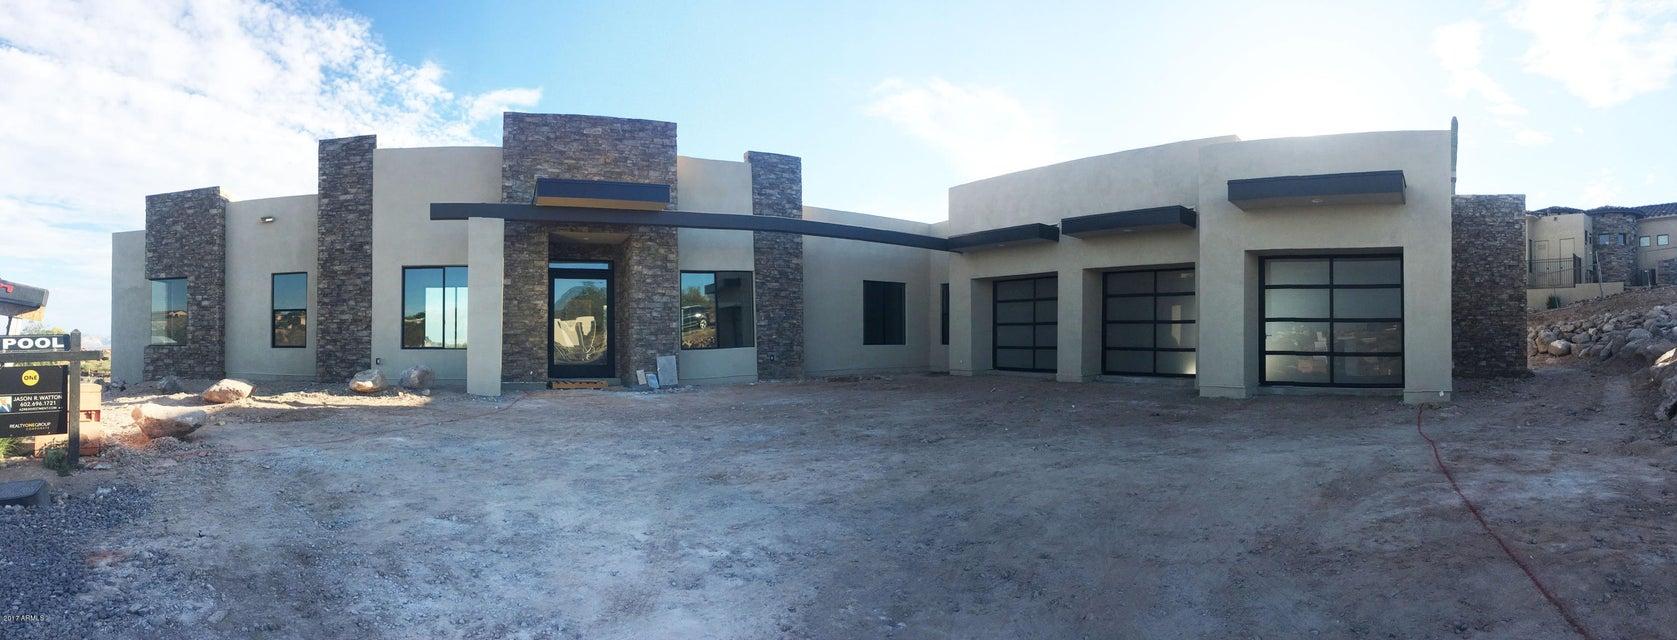 15637 E PALATIAL Drive Fountain Hills, AZ 85268 - MLS #: 5695783